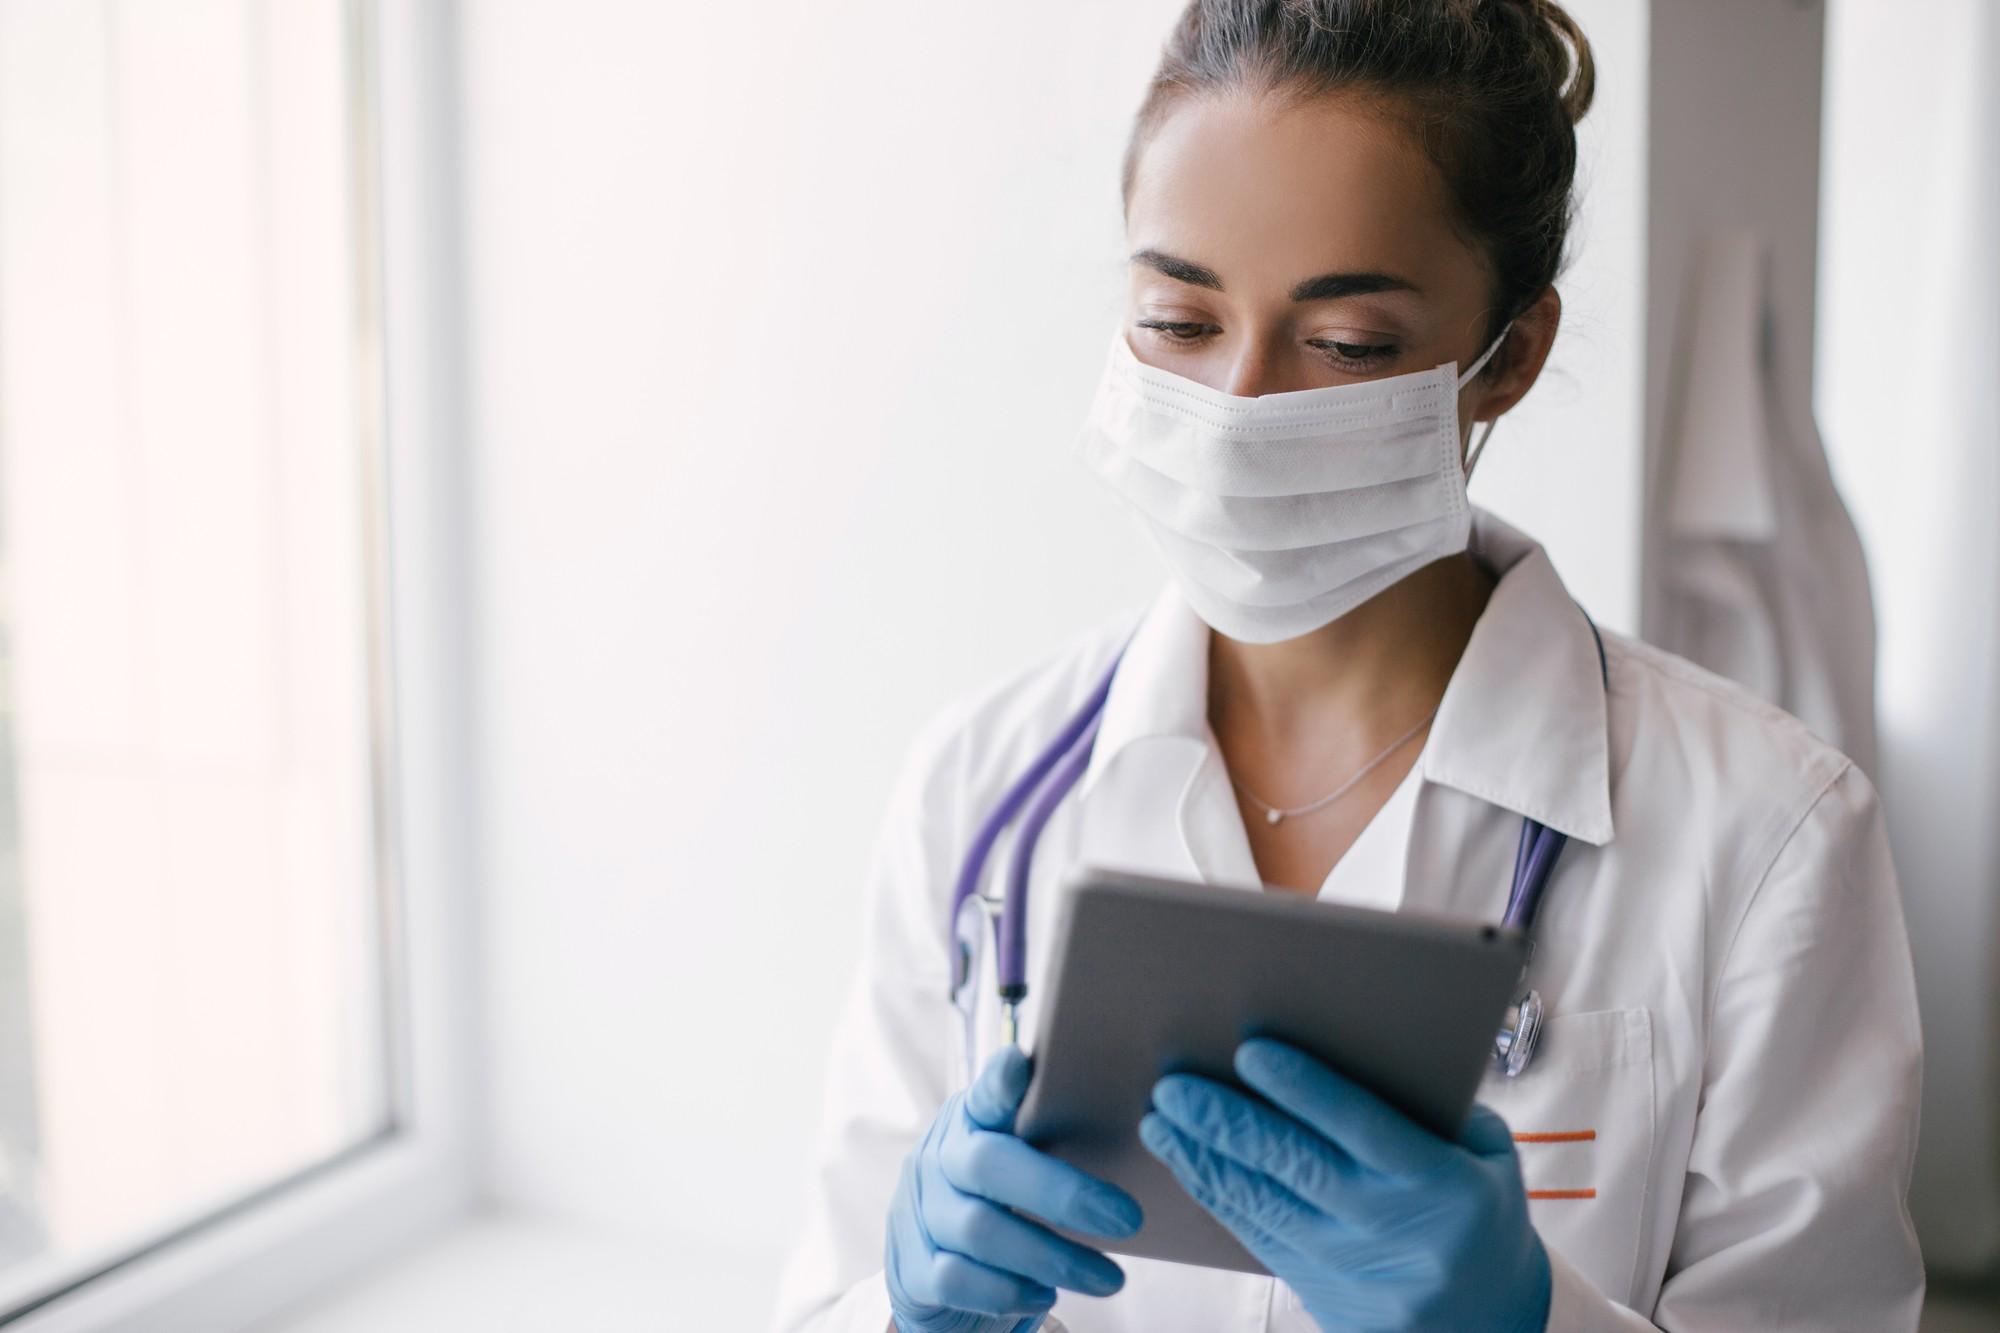 medica com prontuario digital em tablet